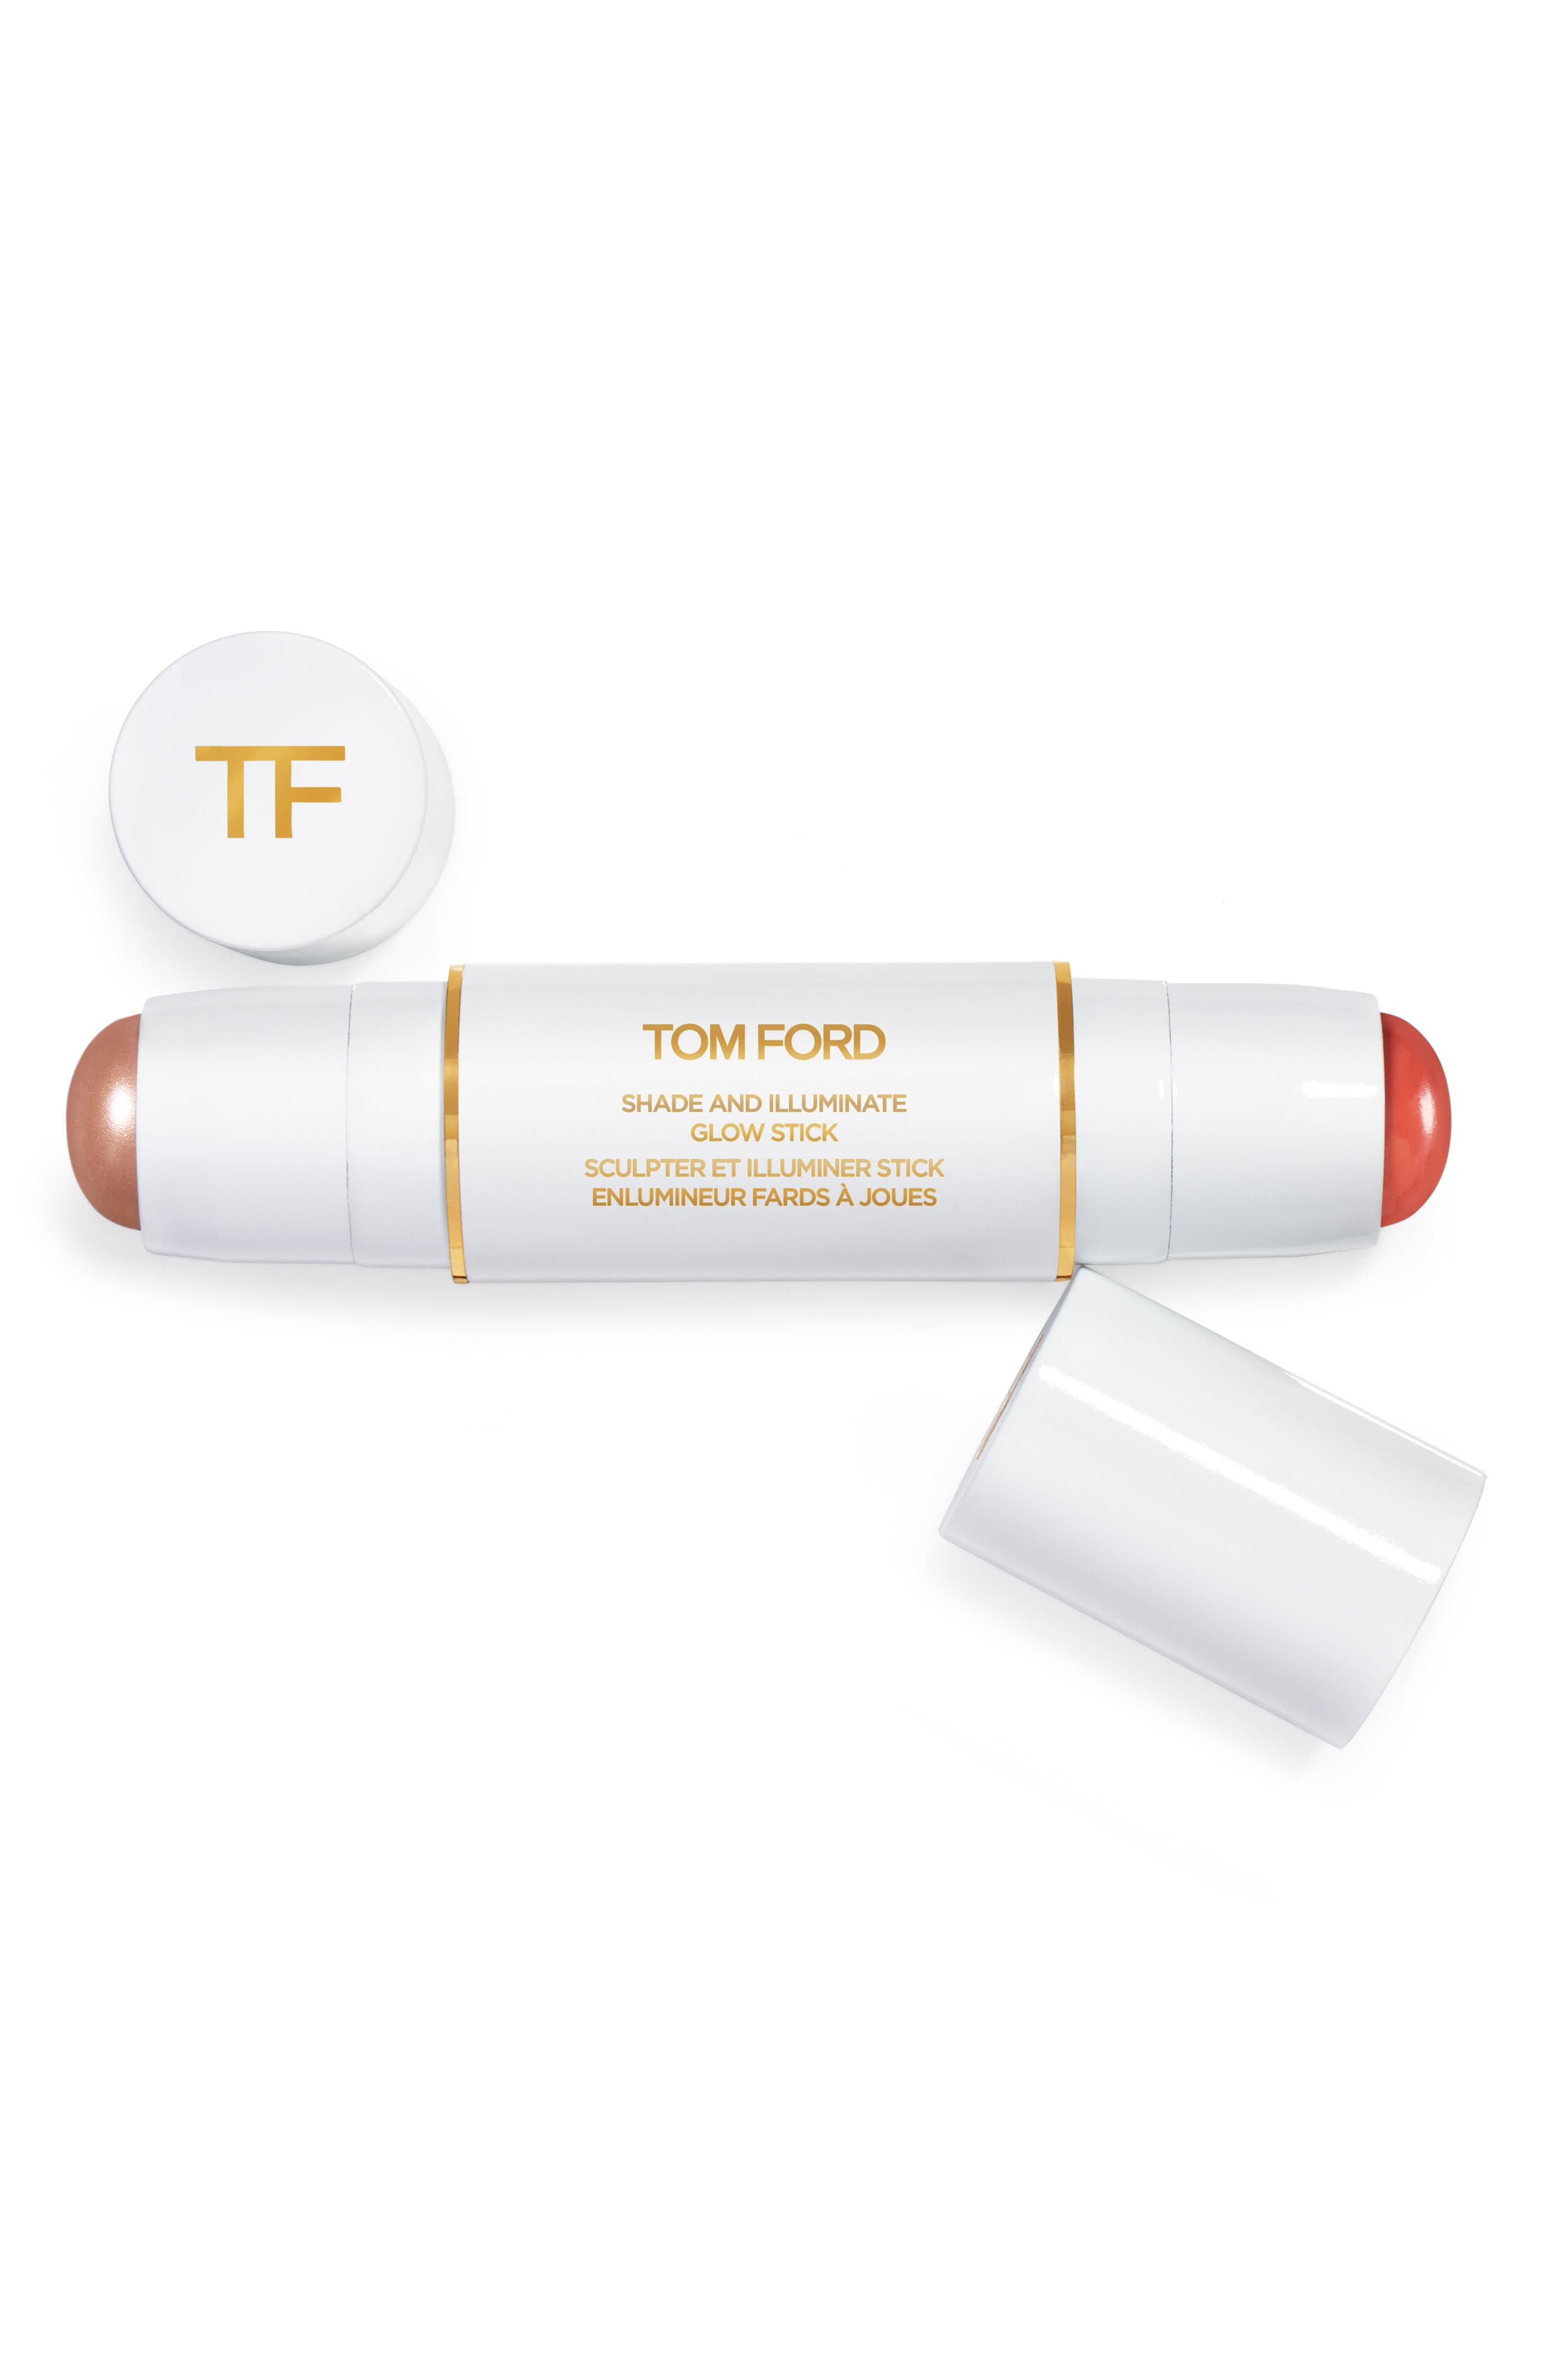 Tom Ford Shade & Illuminate Glow Stick